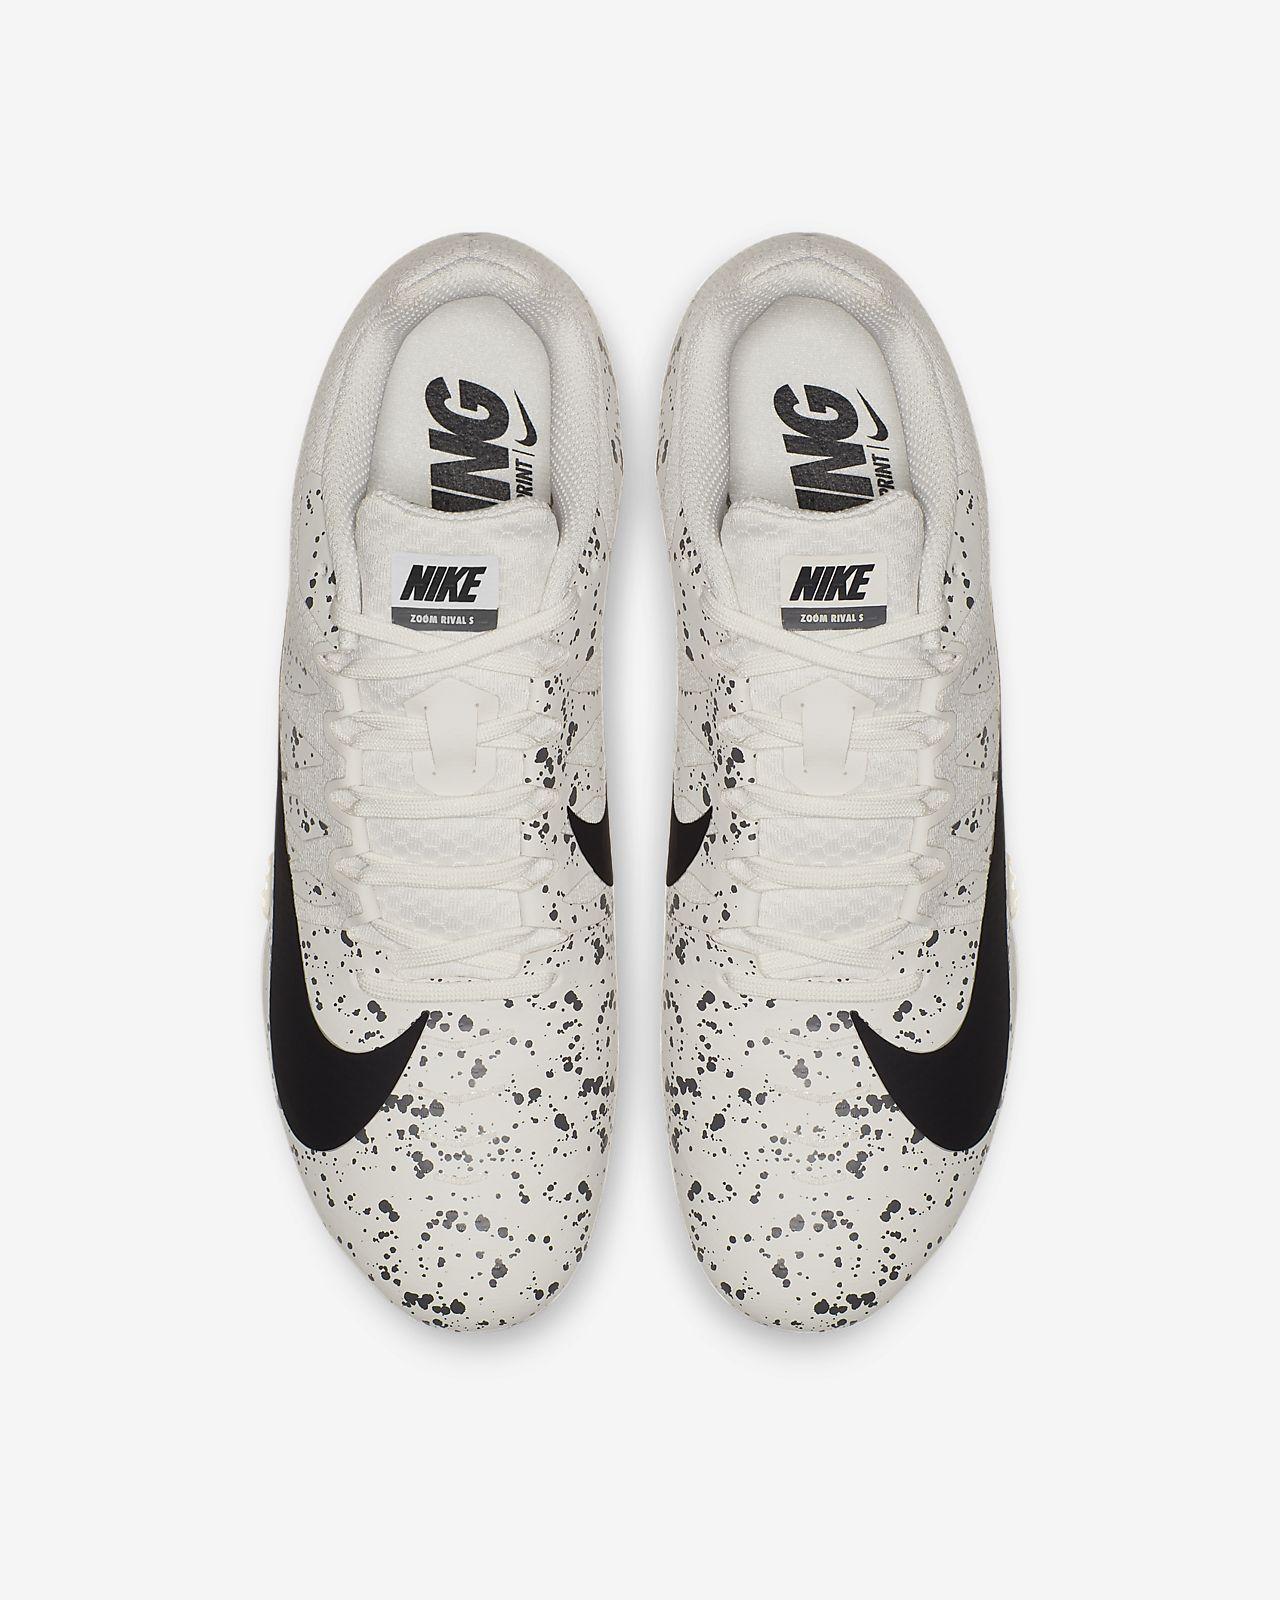 promo code ce20d 0bc91 ... Spiksko Nike Zoom Rival S 9 Unisex